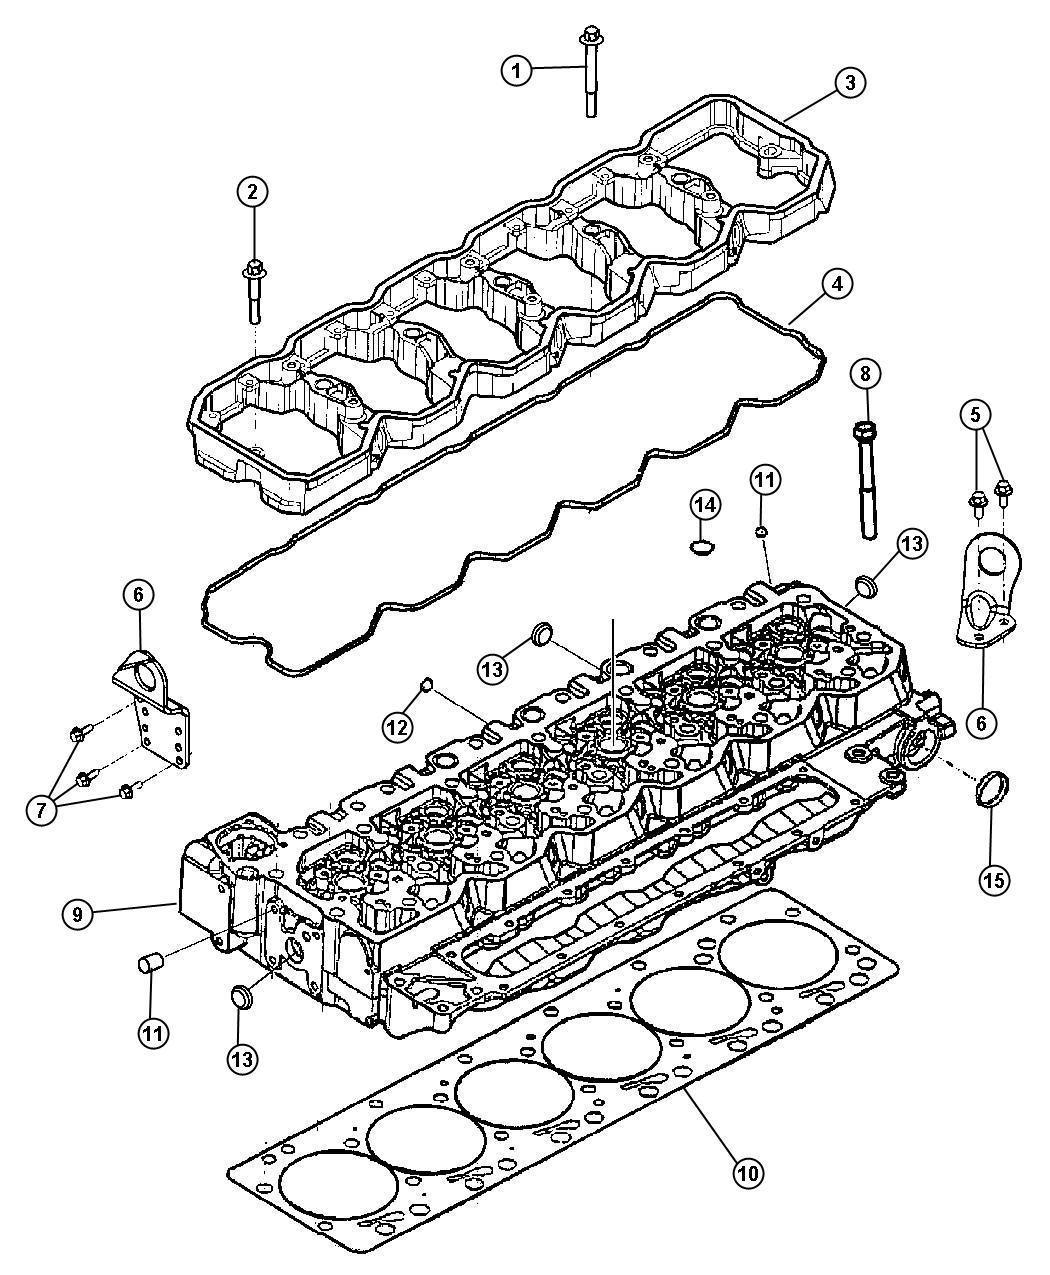 Dodge Ram Head Cylinder Emissions State